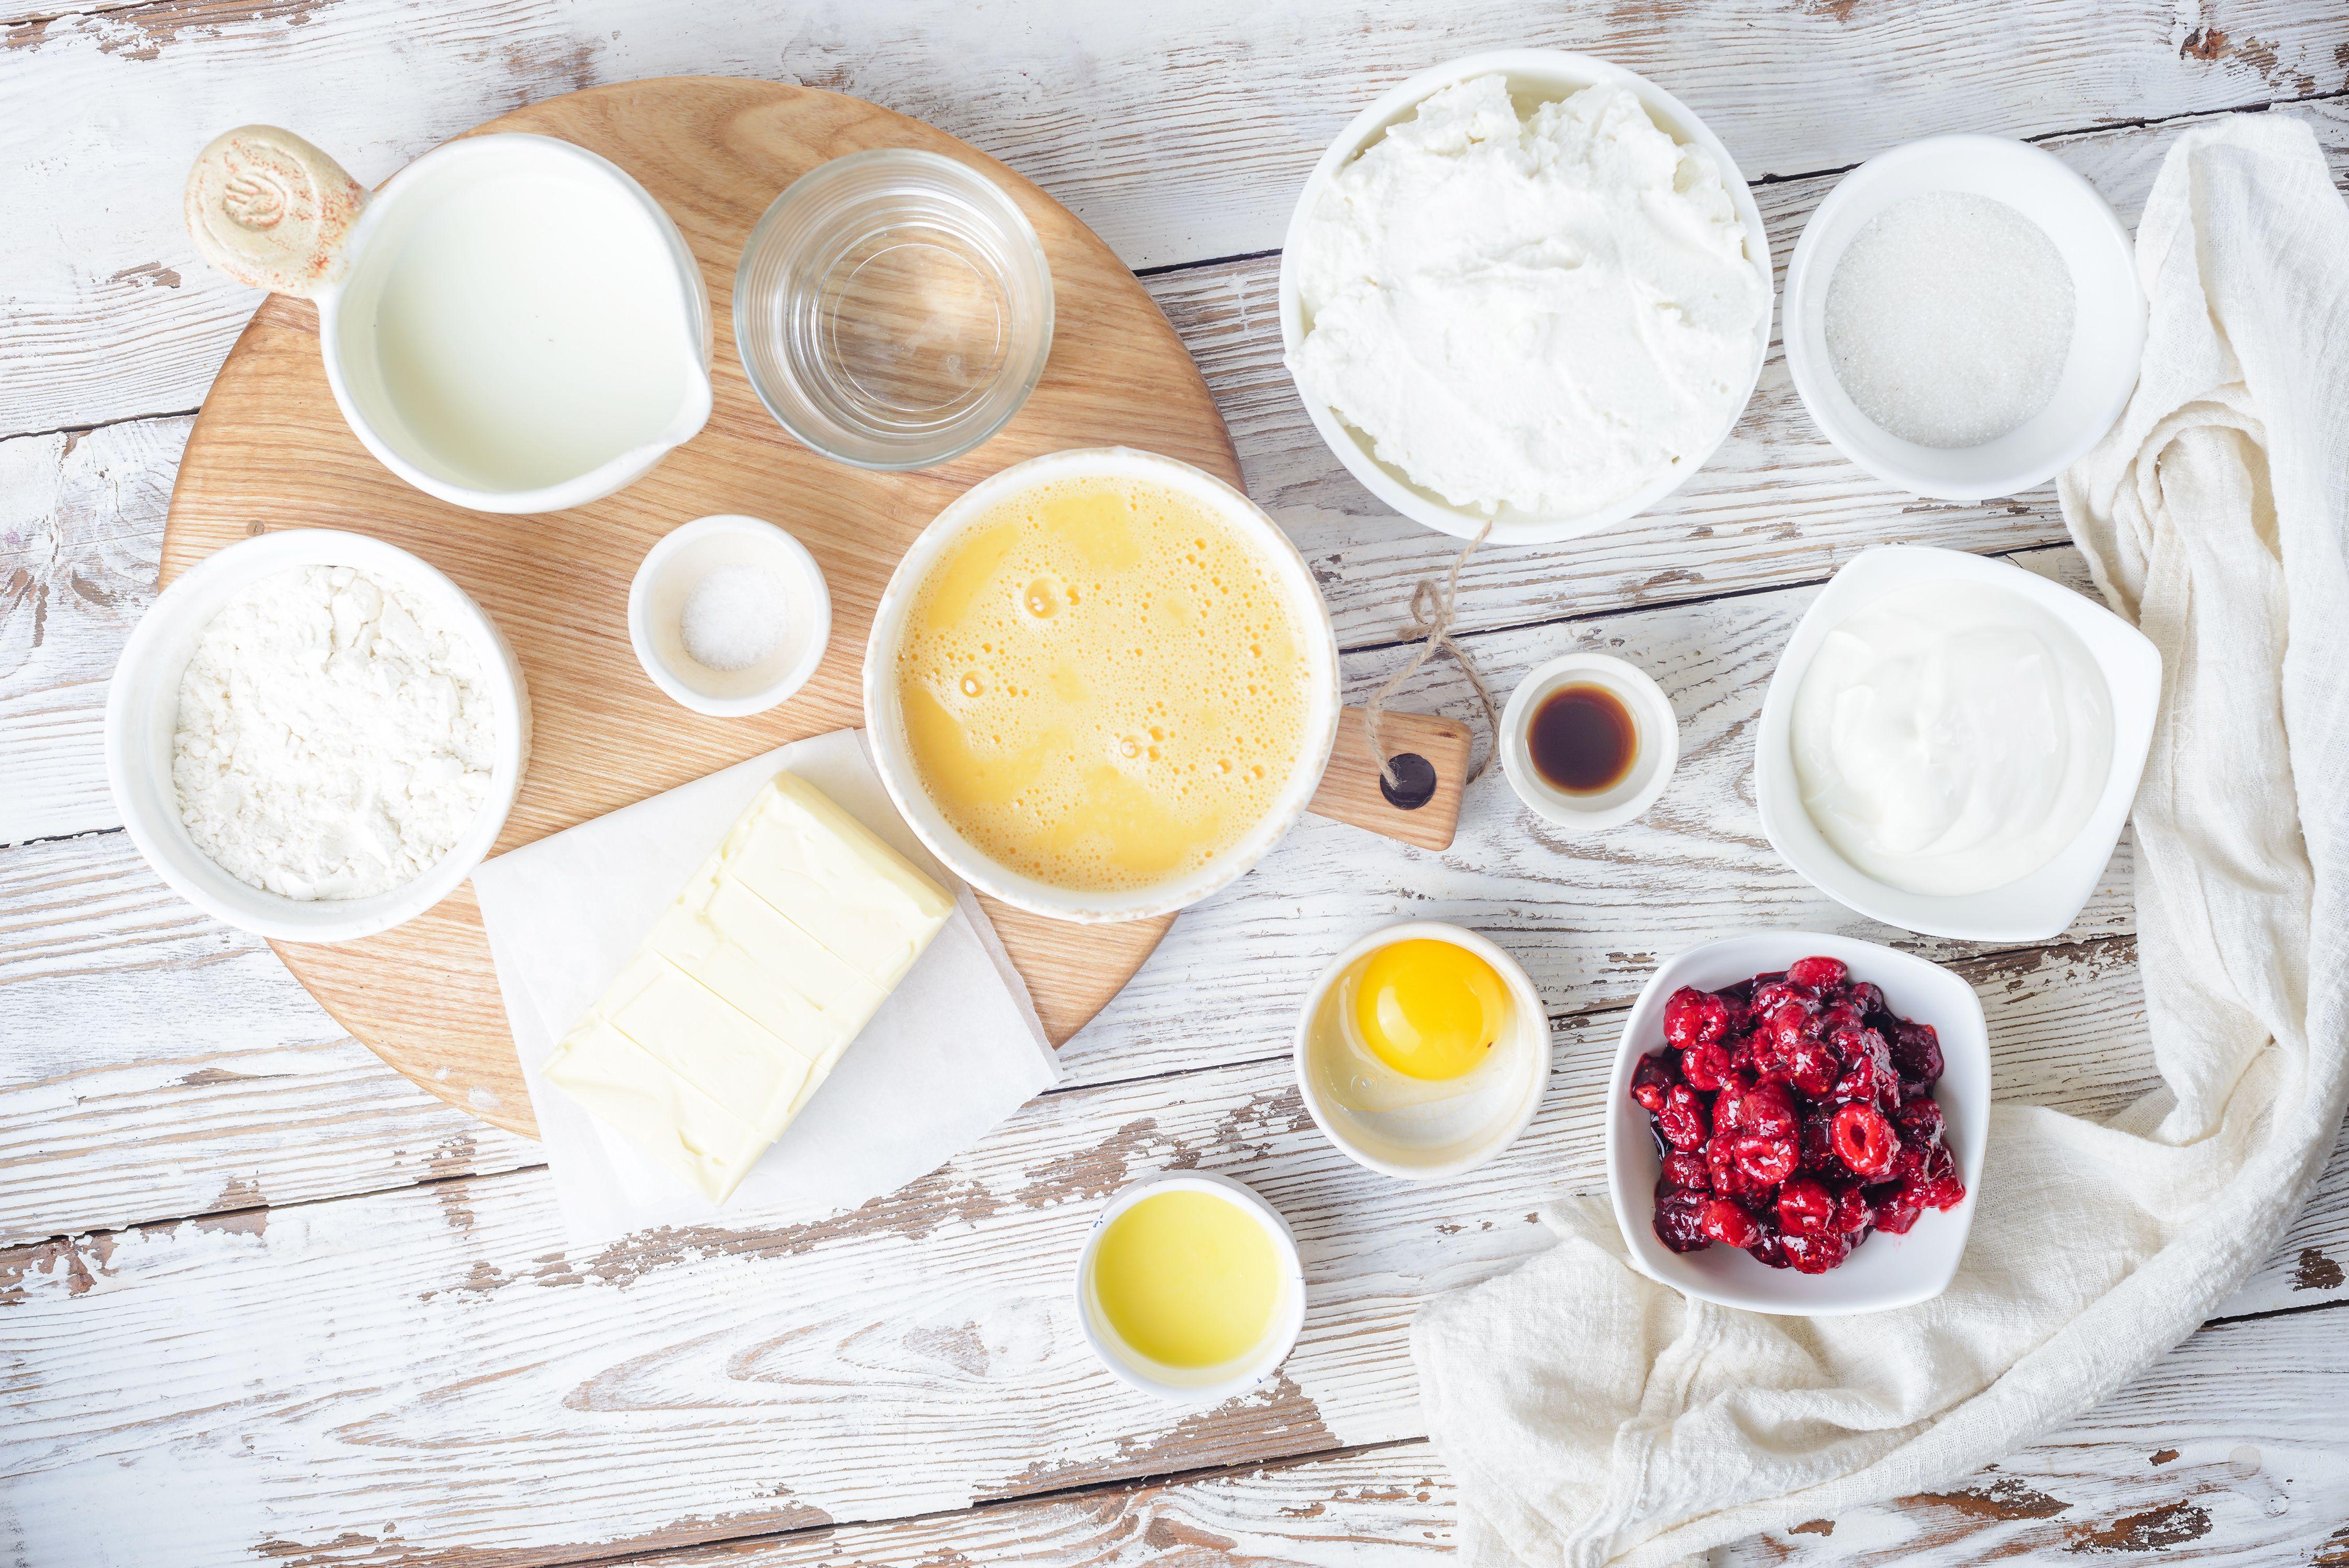 Ingredients for Jewish cheese blintzes